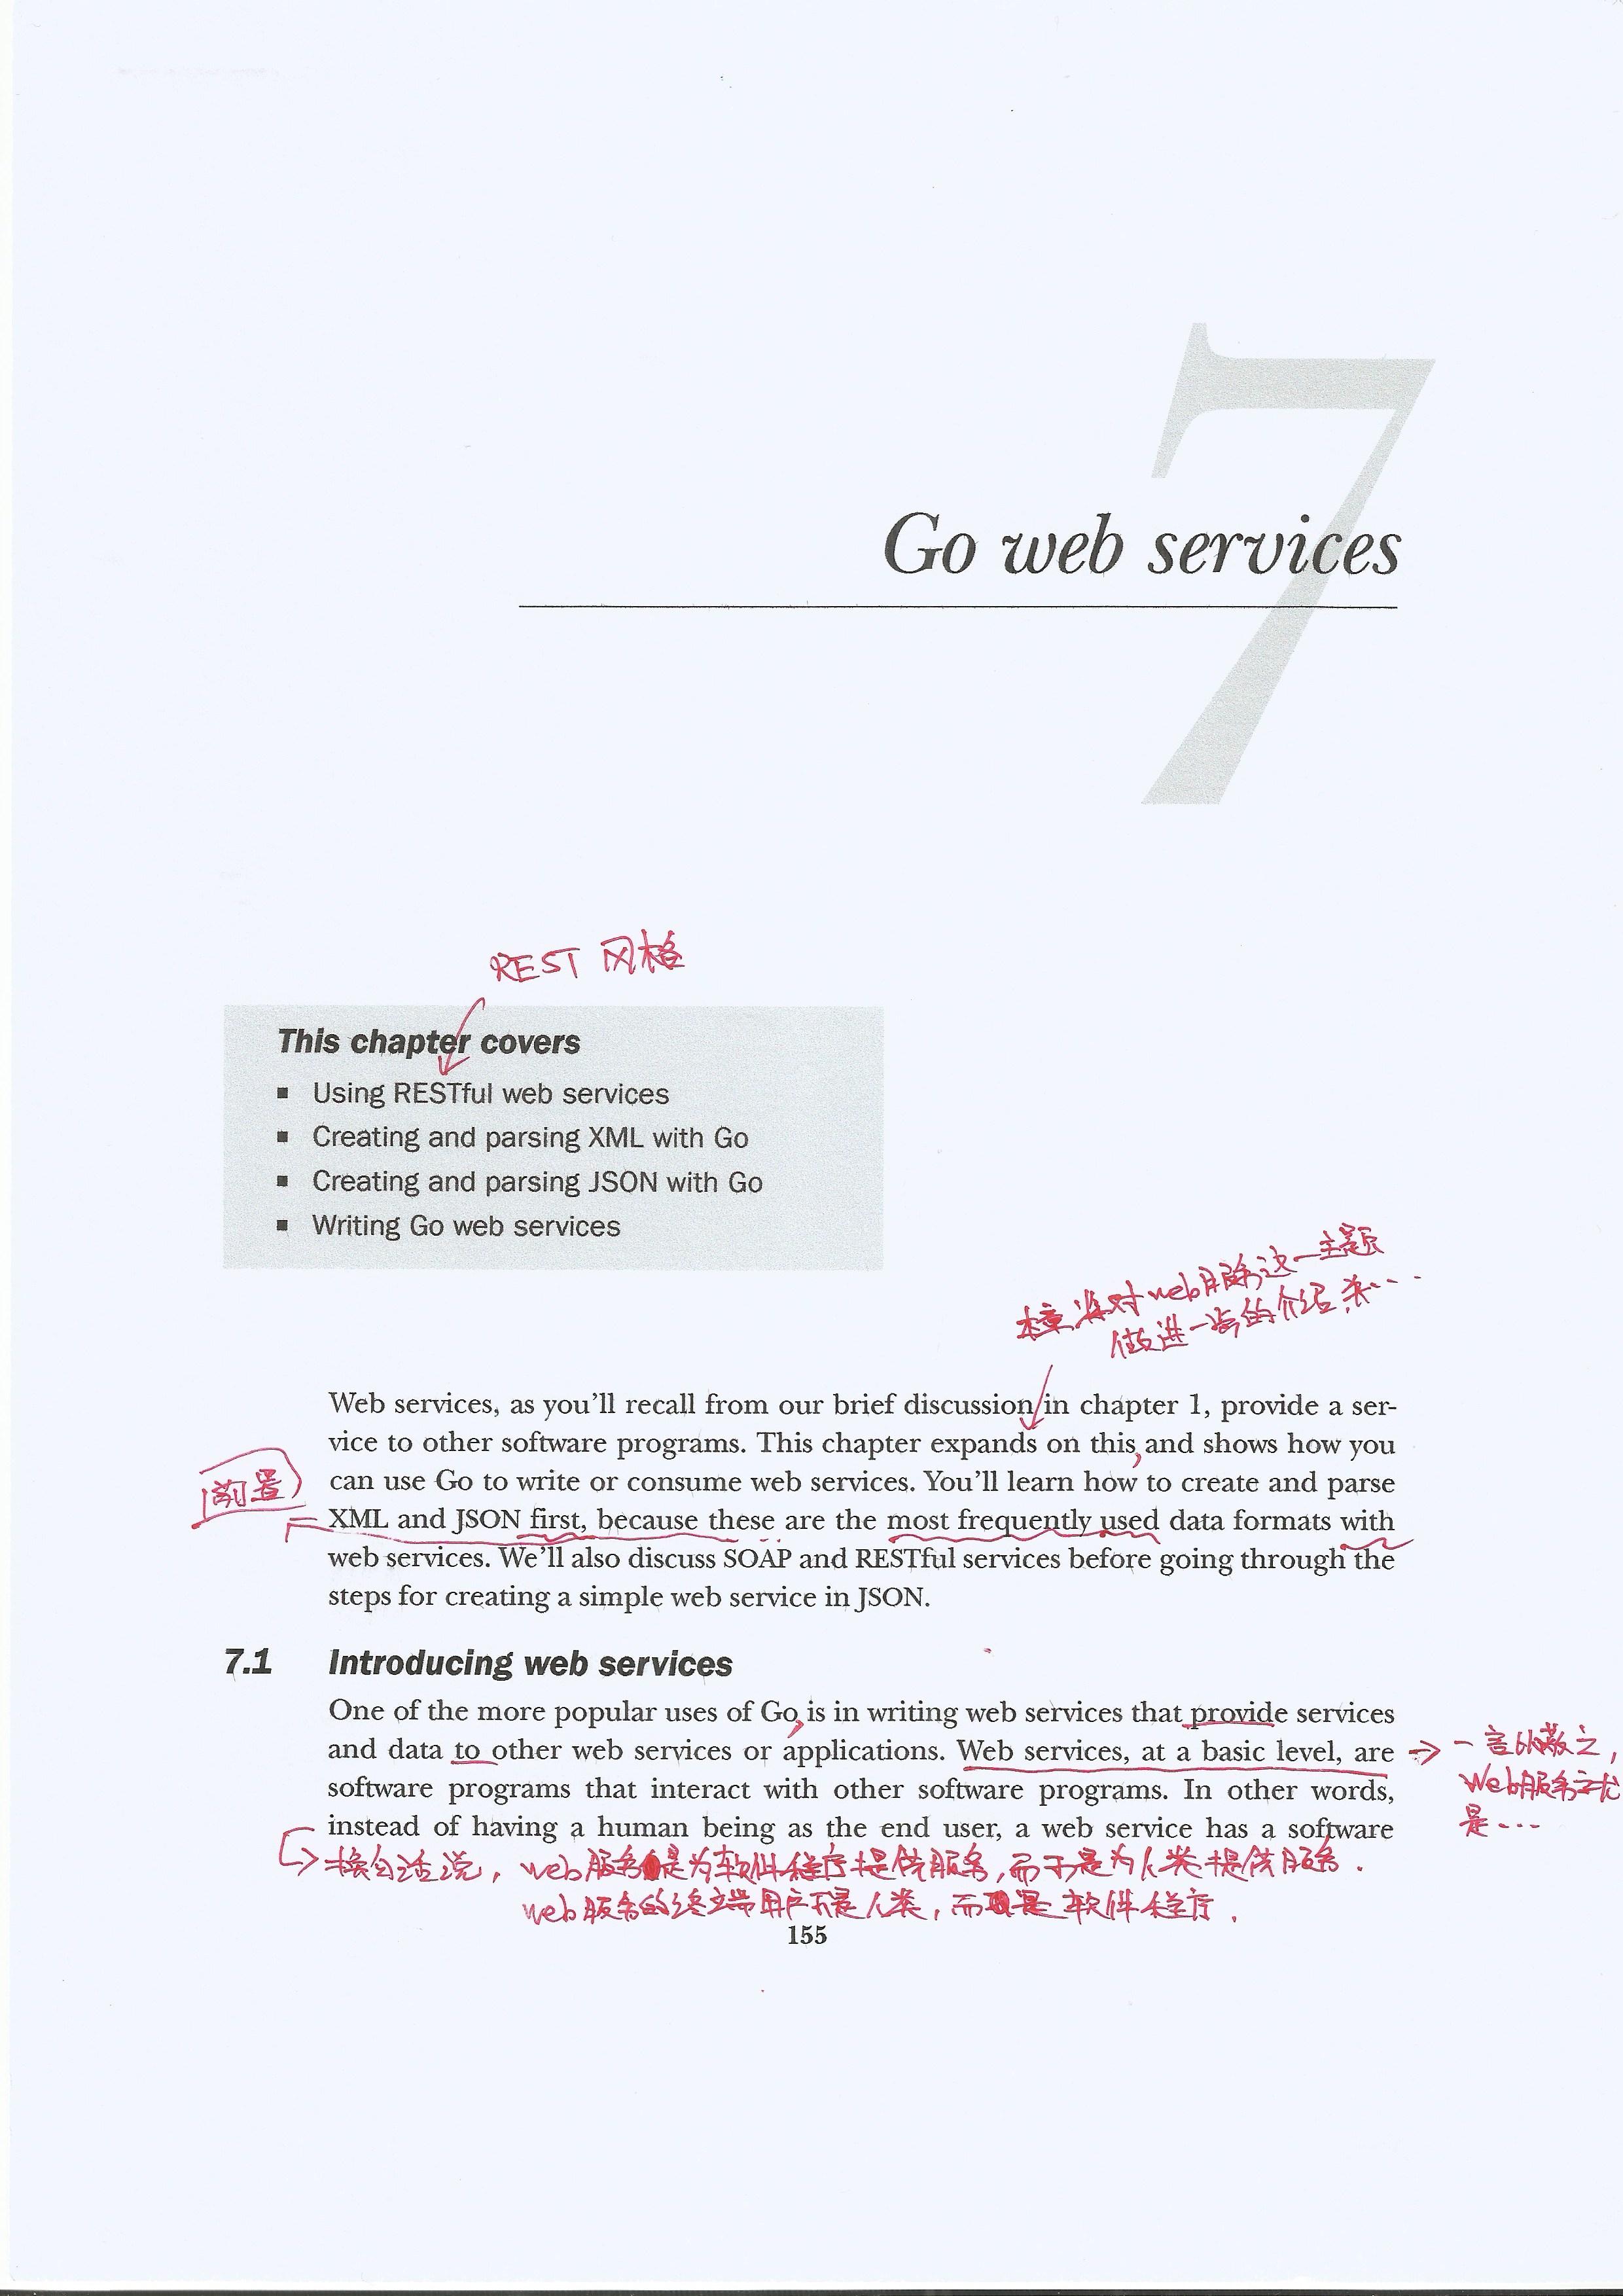 https://github.com/huangz1990/gwpcn-translation-manuscript/blob/master/page155.jpeg?raw=true